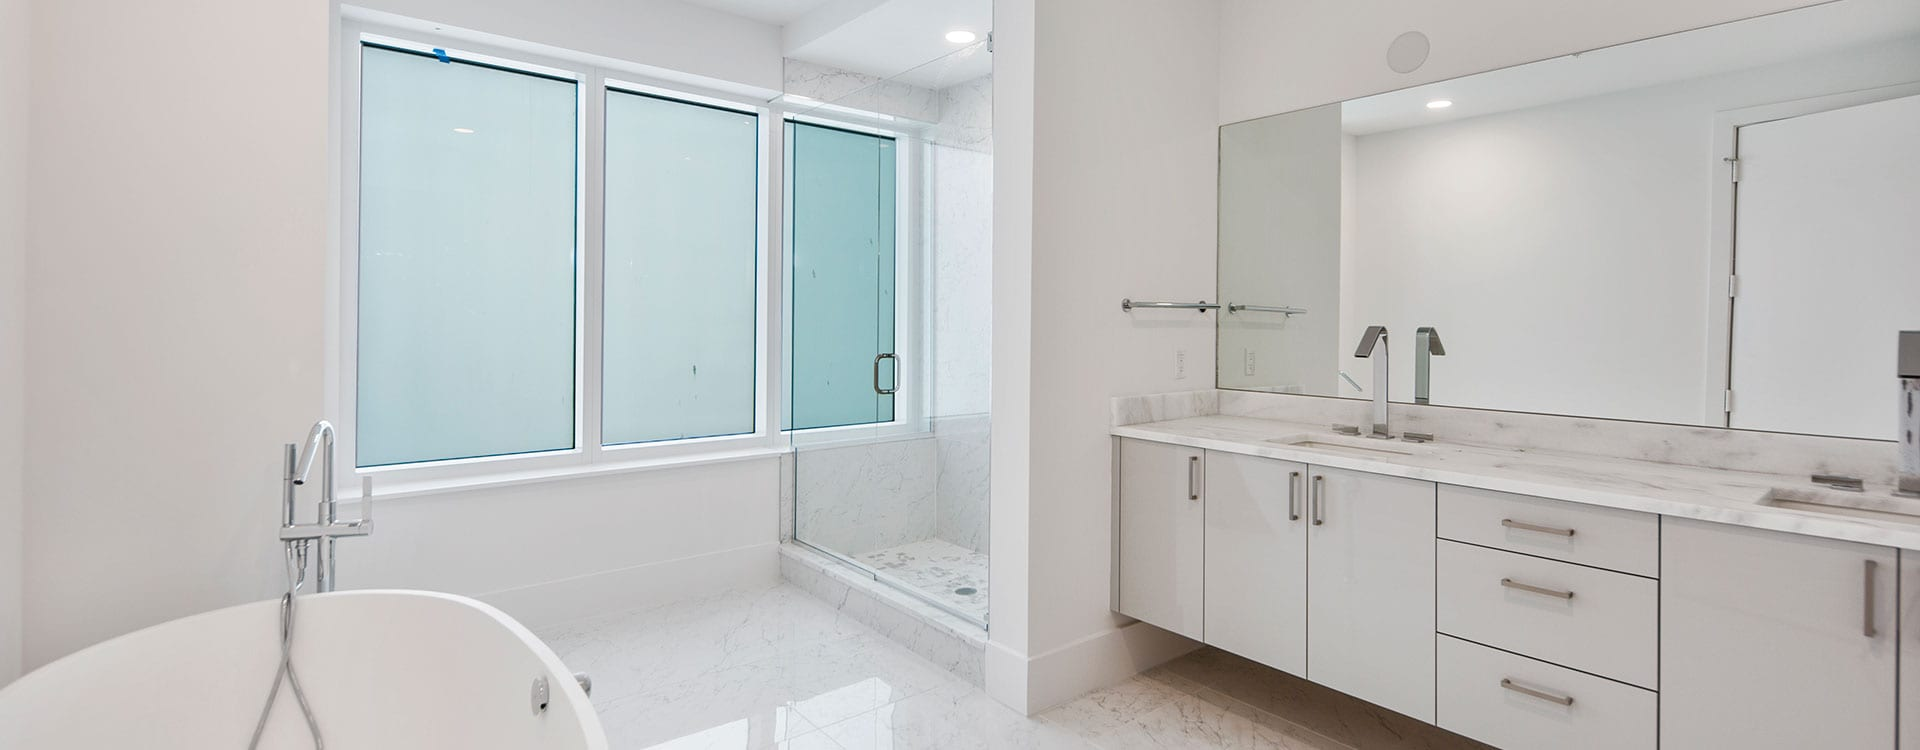 BLVD Sarasota Residence 803 Bathroom